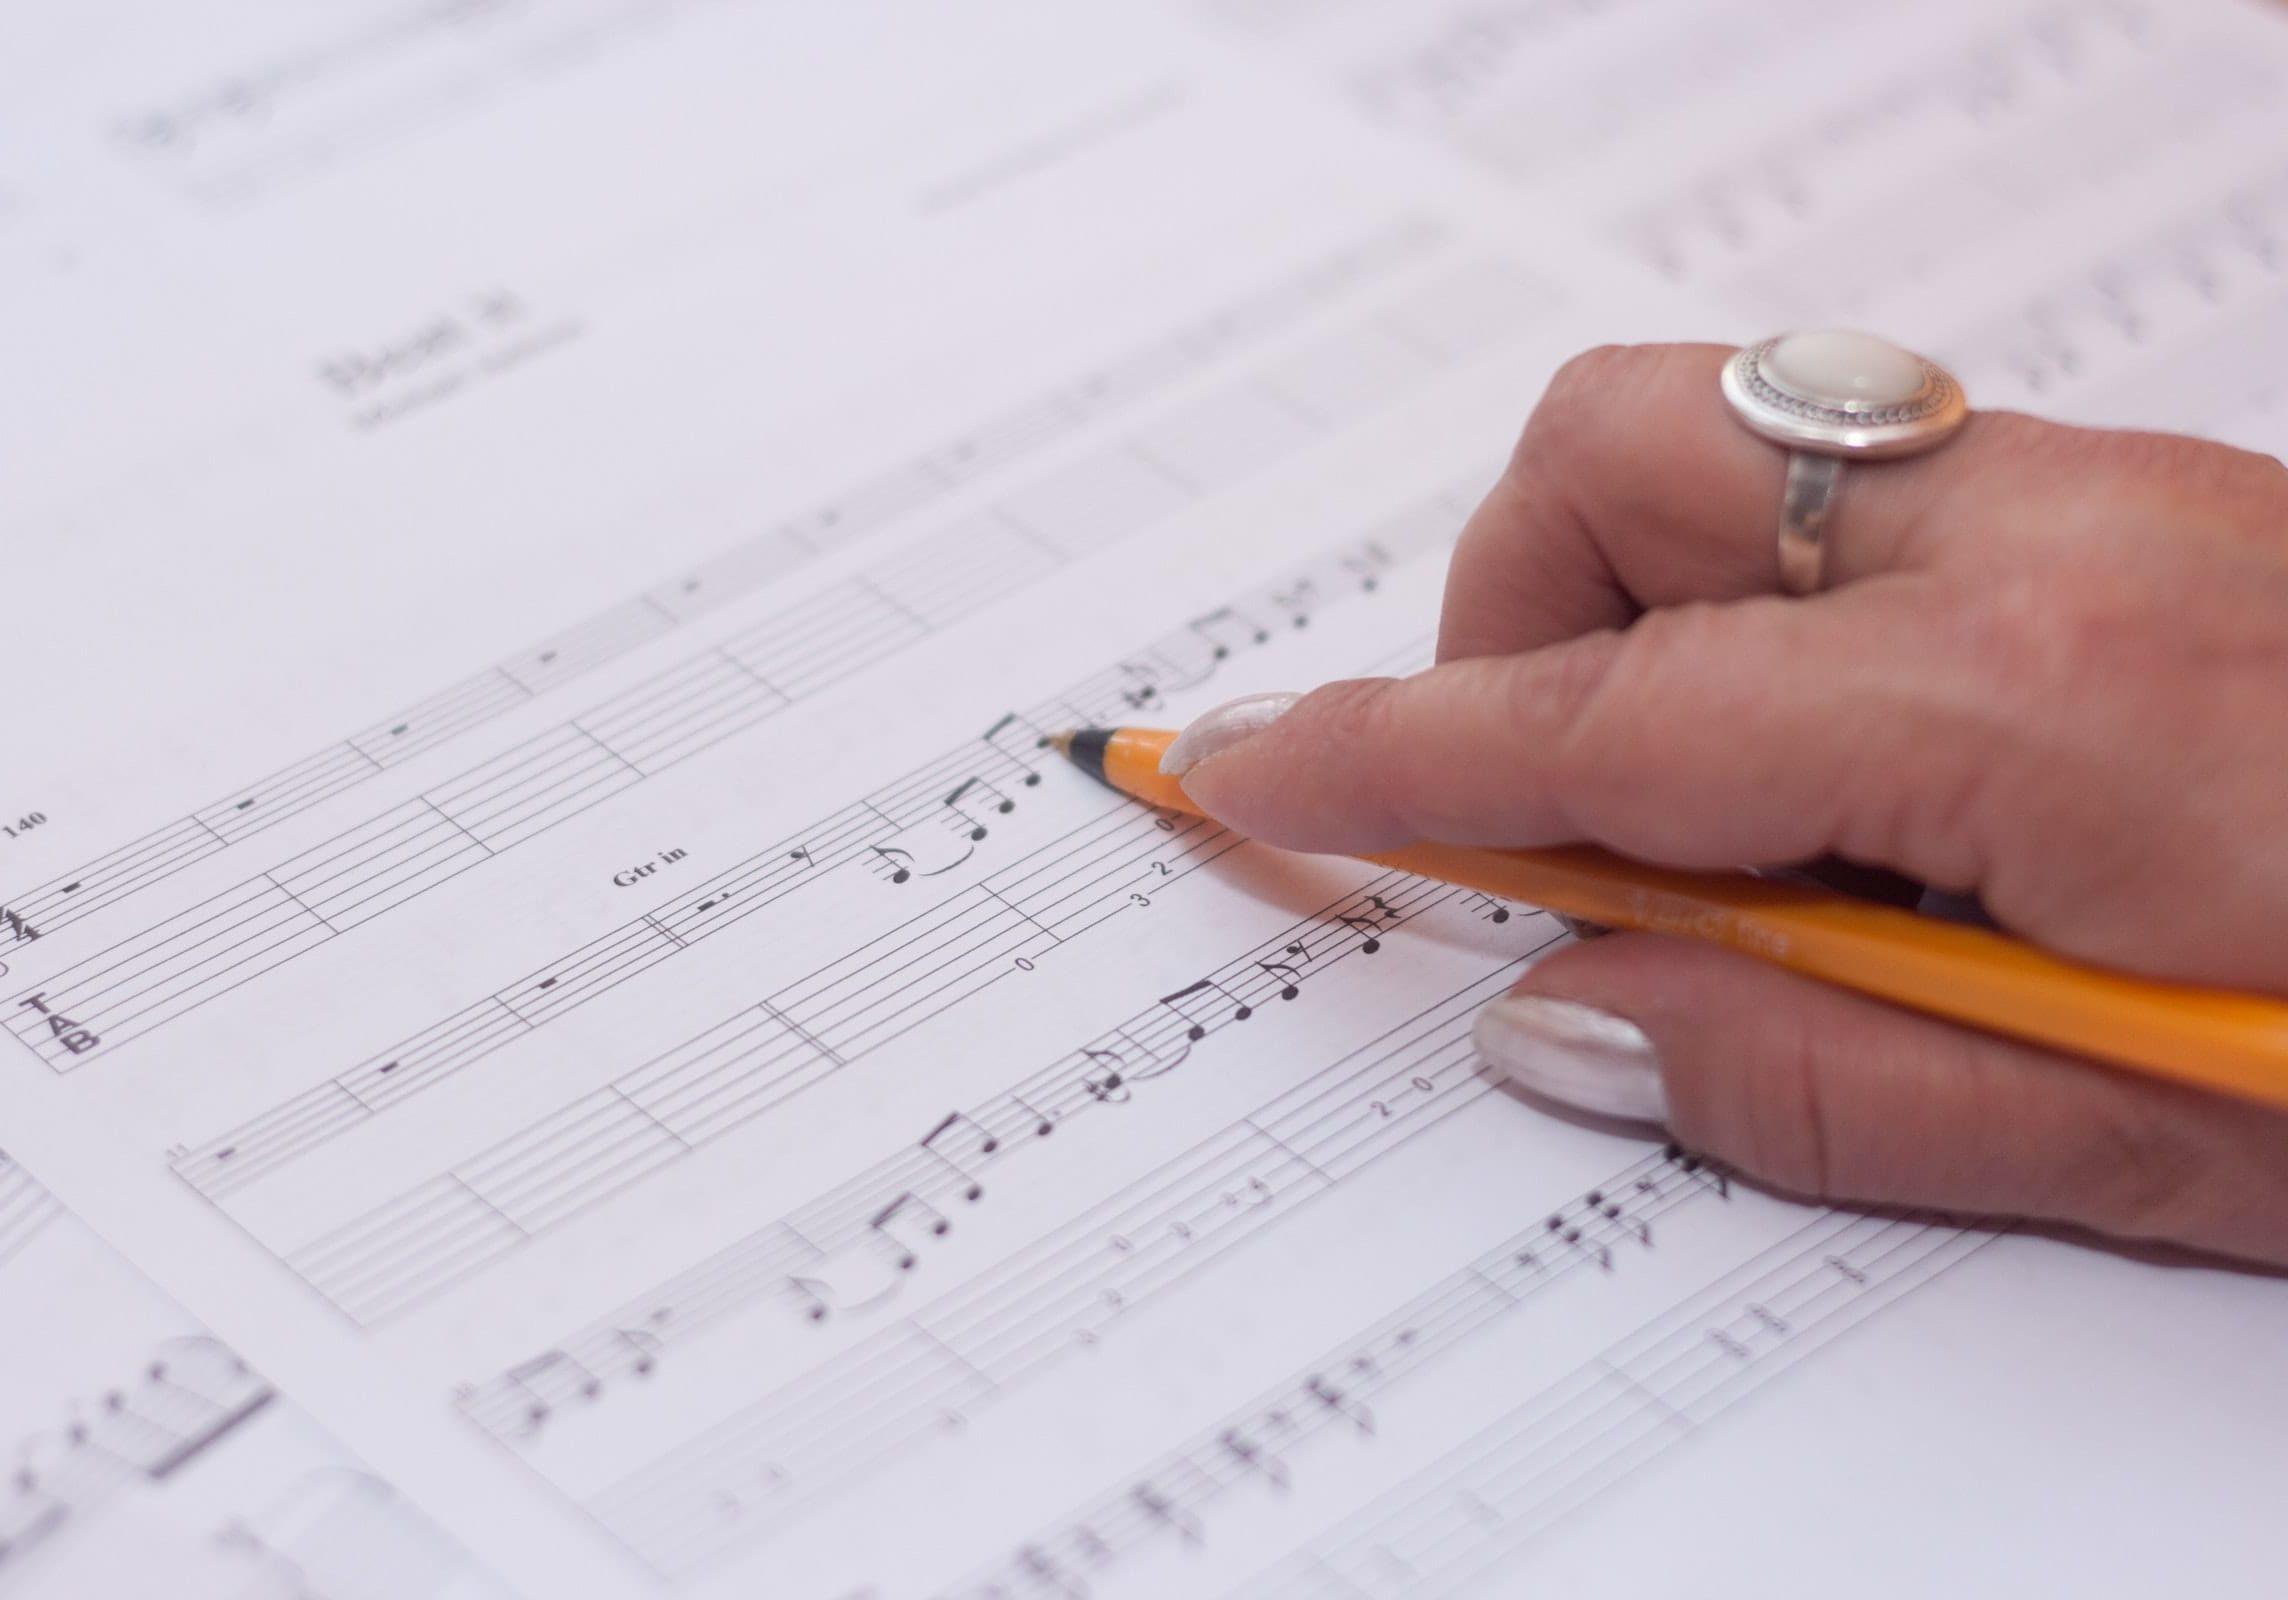 Curso preparatério de vestibular de música Curitiba - Cursinho pré-vestibular Escola de Música Ritmo e SomCurso preparatério de vestibular de música Curitiba - Cursinho pré-vestibular Escola de Música Ritmo e Som